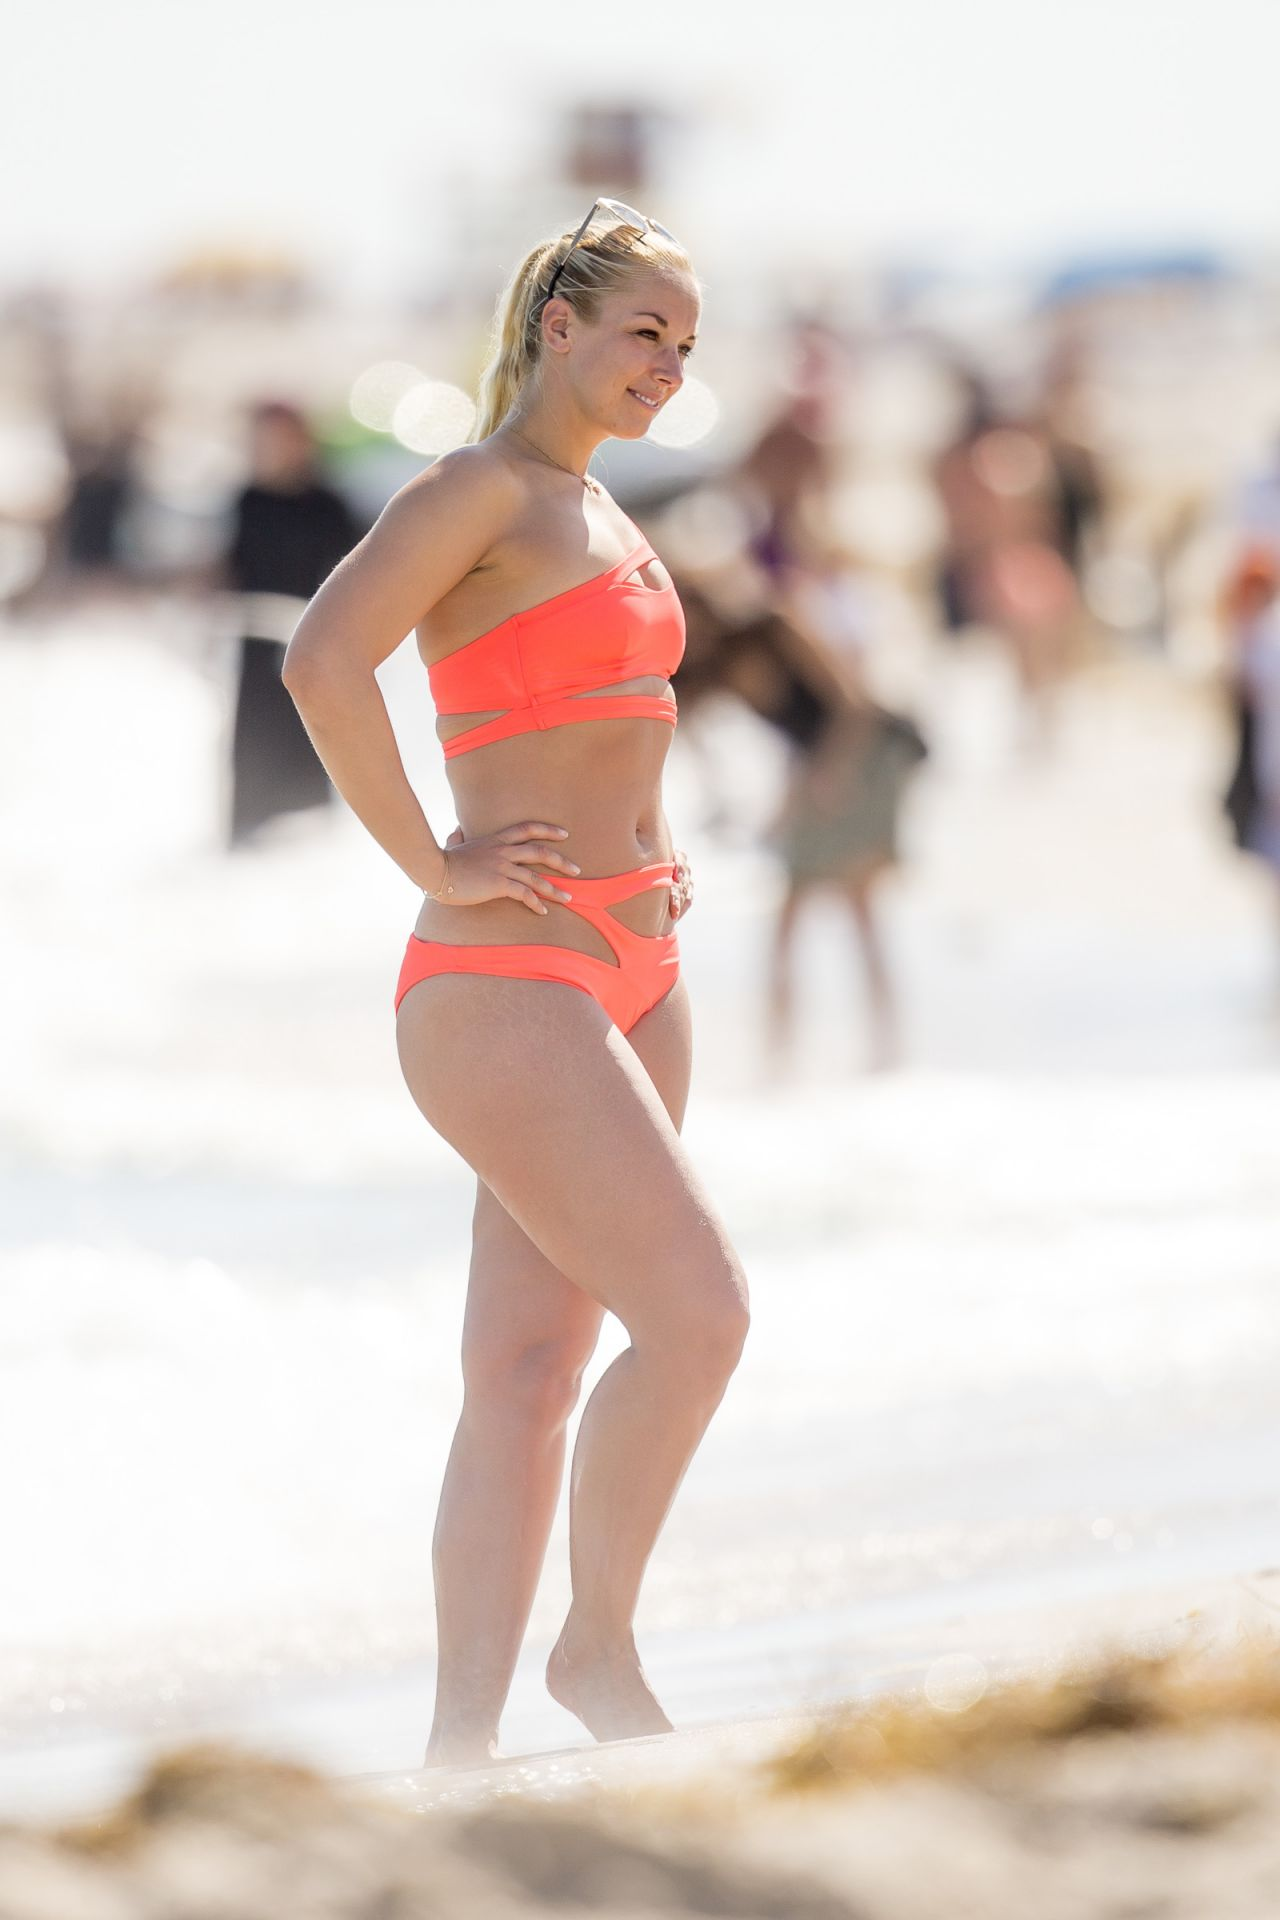 Sabine Lisicki Enjoys A Day In Bikini On Miami Beach 2 3